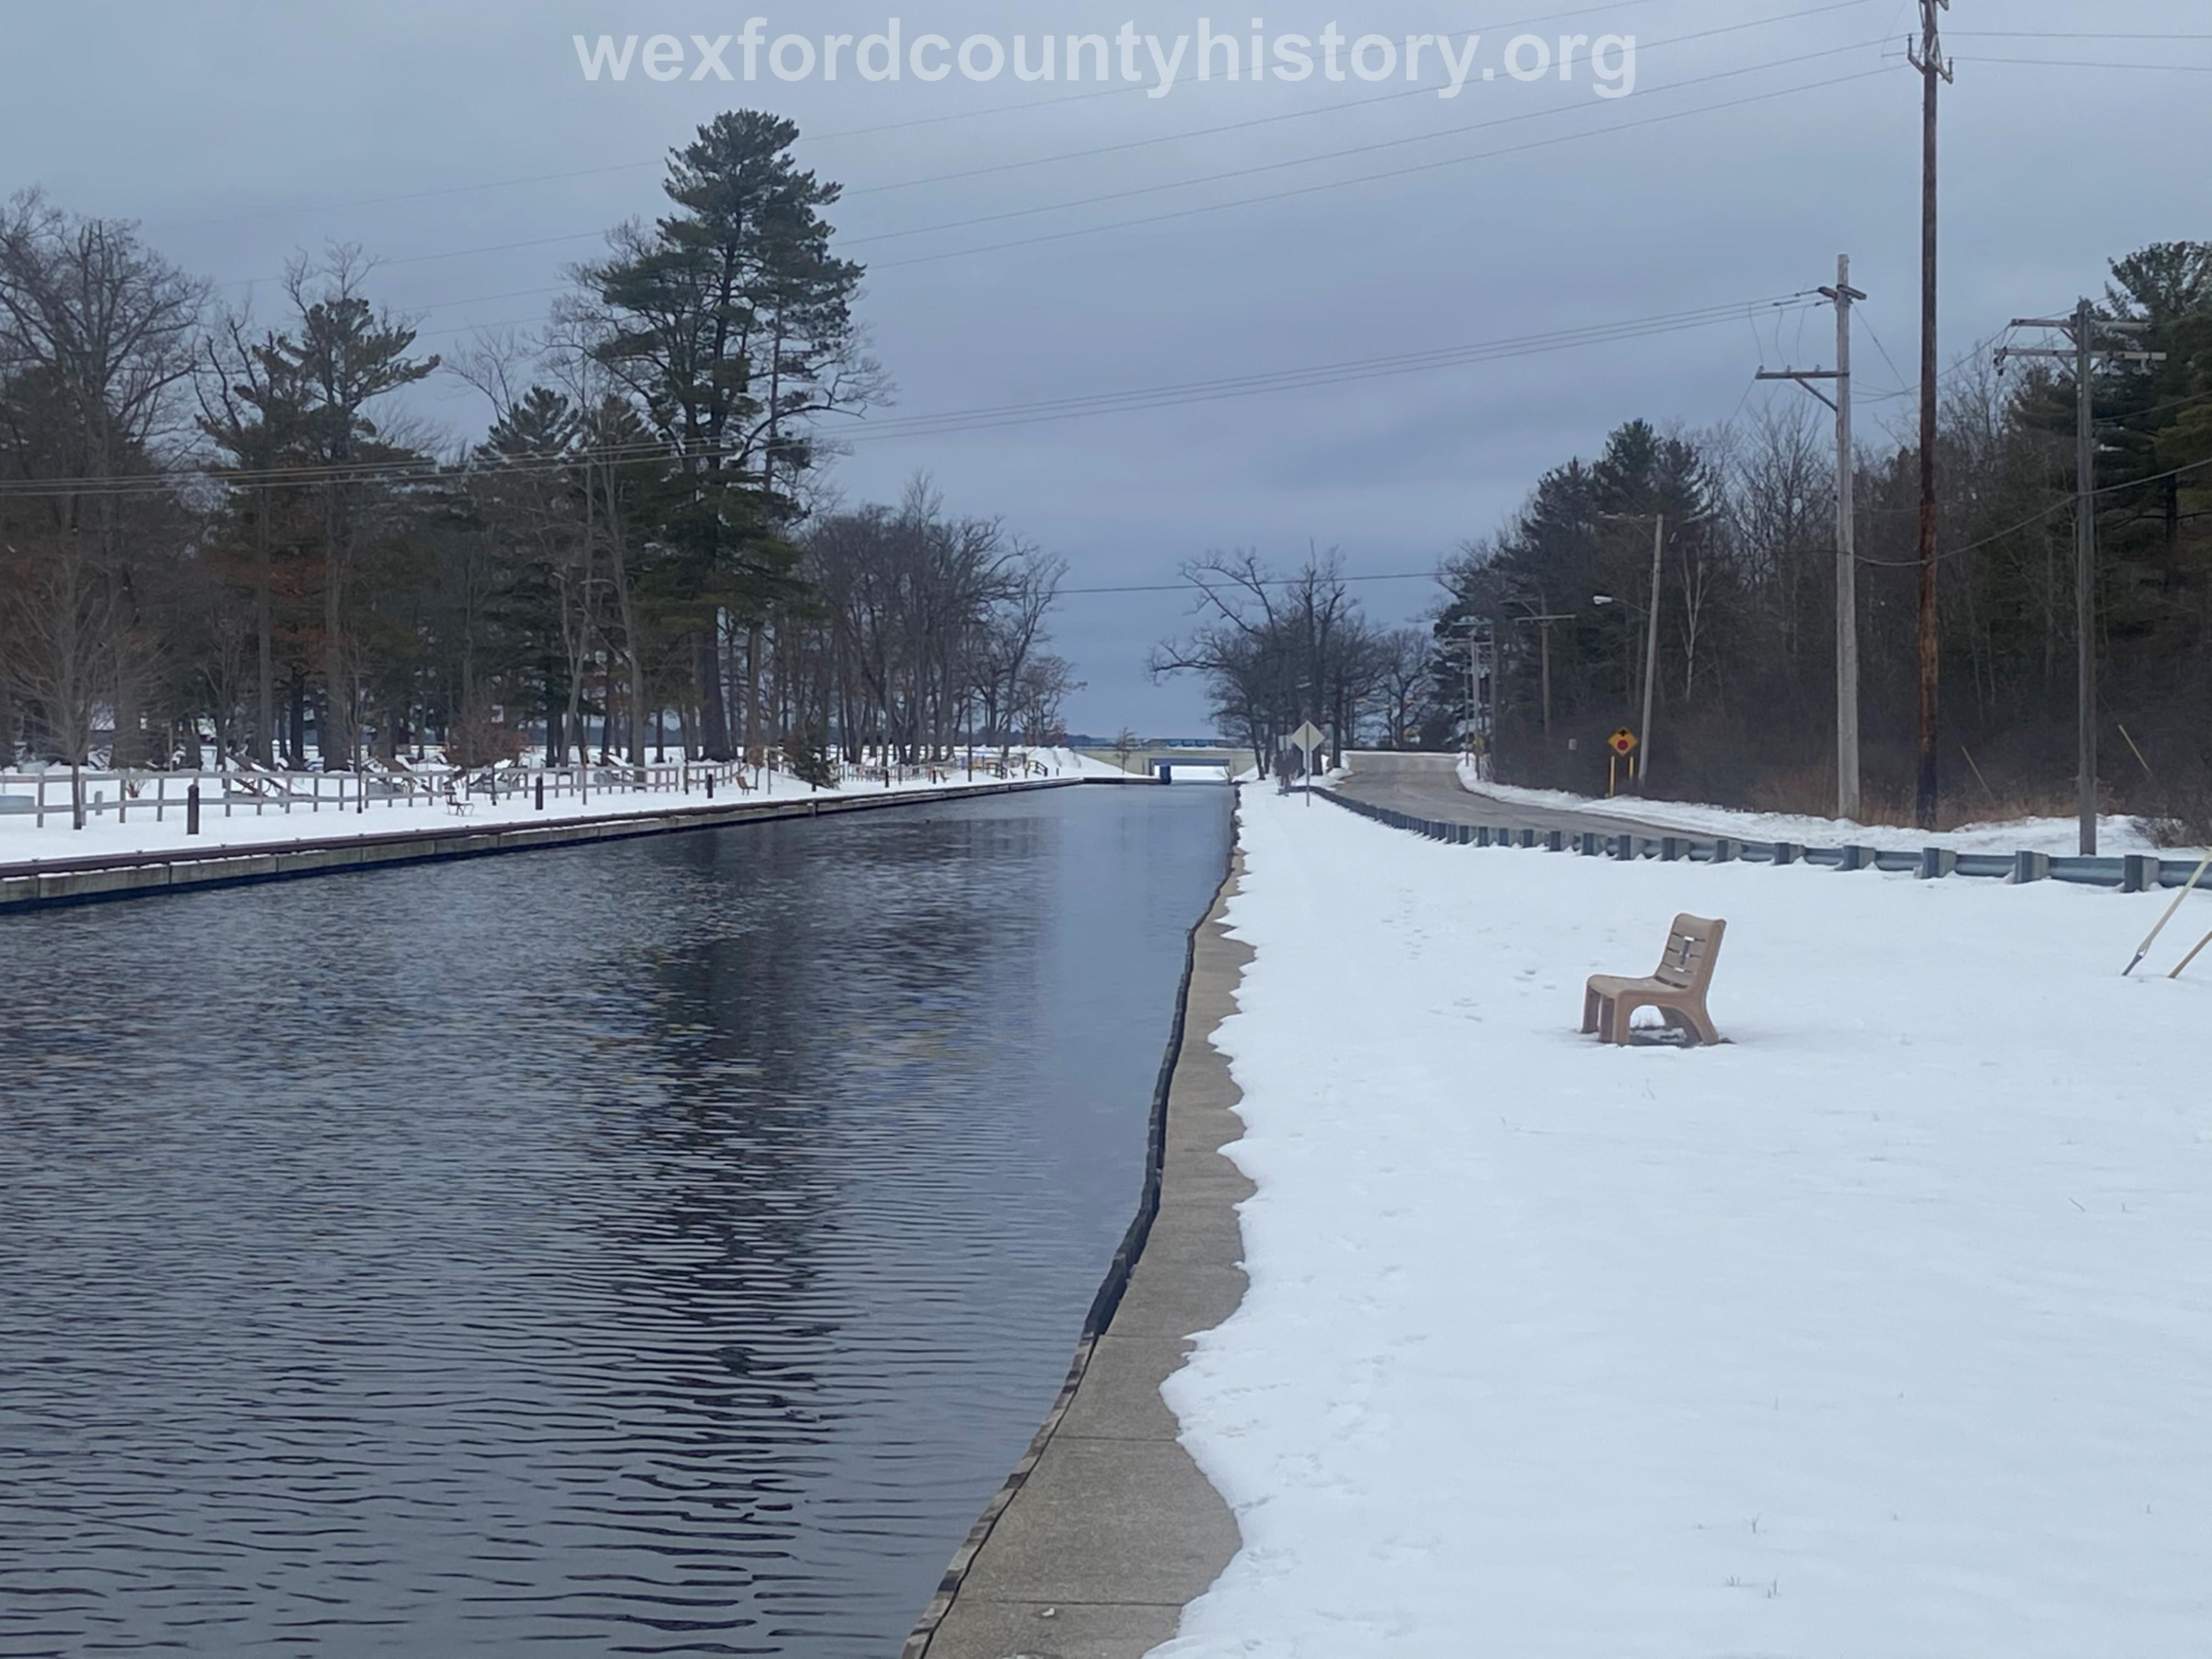 Cadillac-Recreation-The-Canal-January-29-2020-3